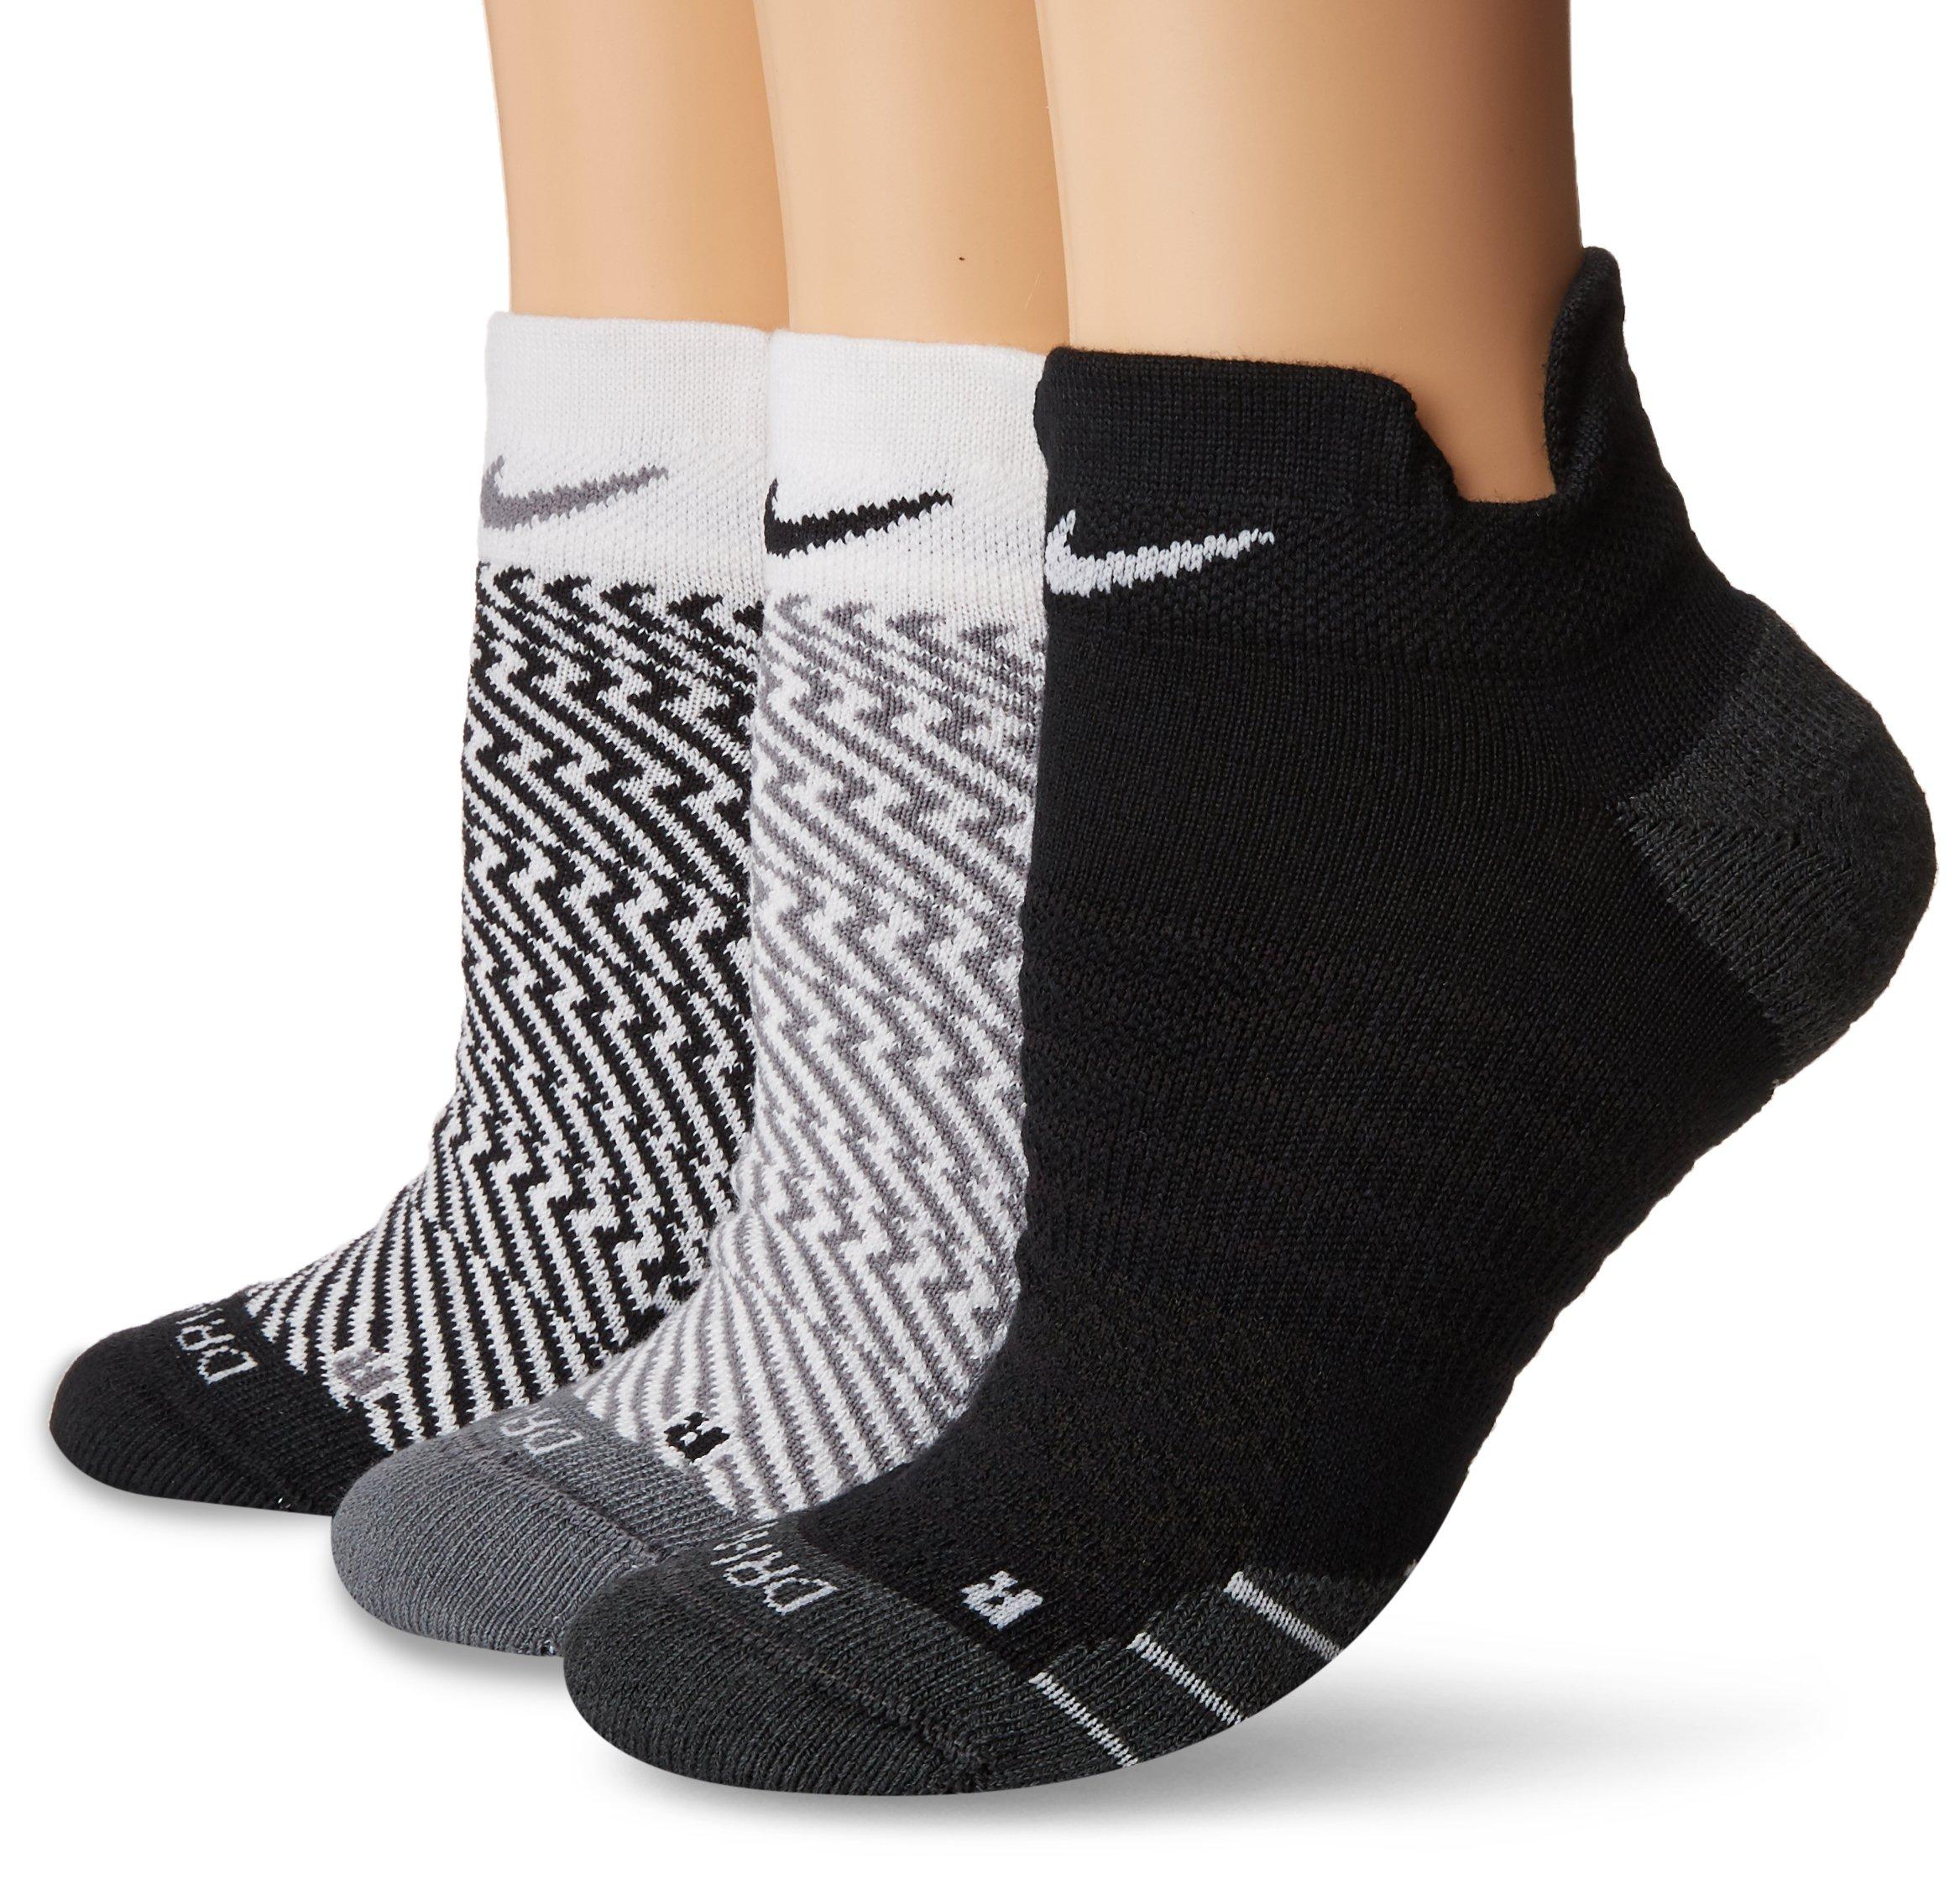 Nike Women`s Dry Cushion Graphic Low Training Socks (3 Pair) (Multicolor 2, MD (Women's Shoe 6-10))